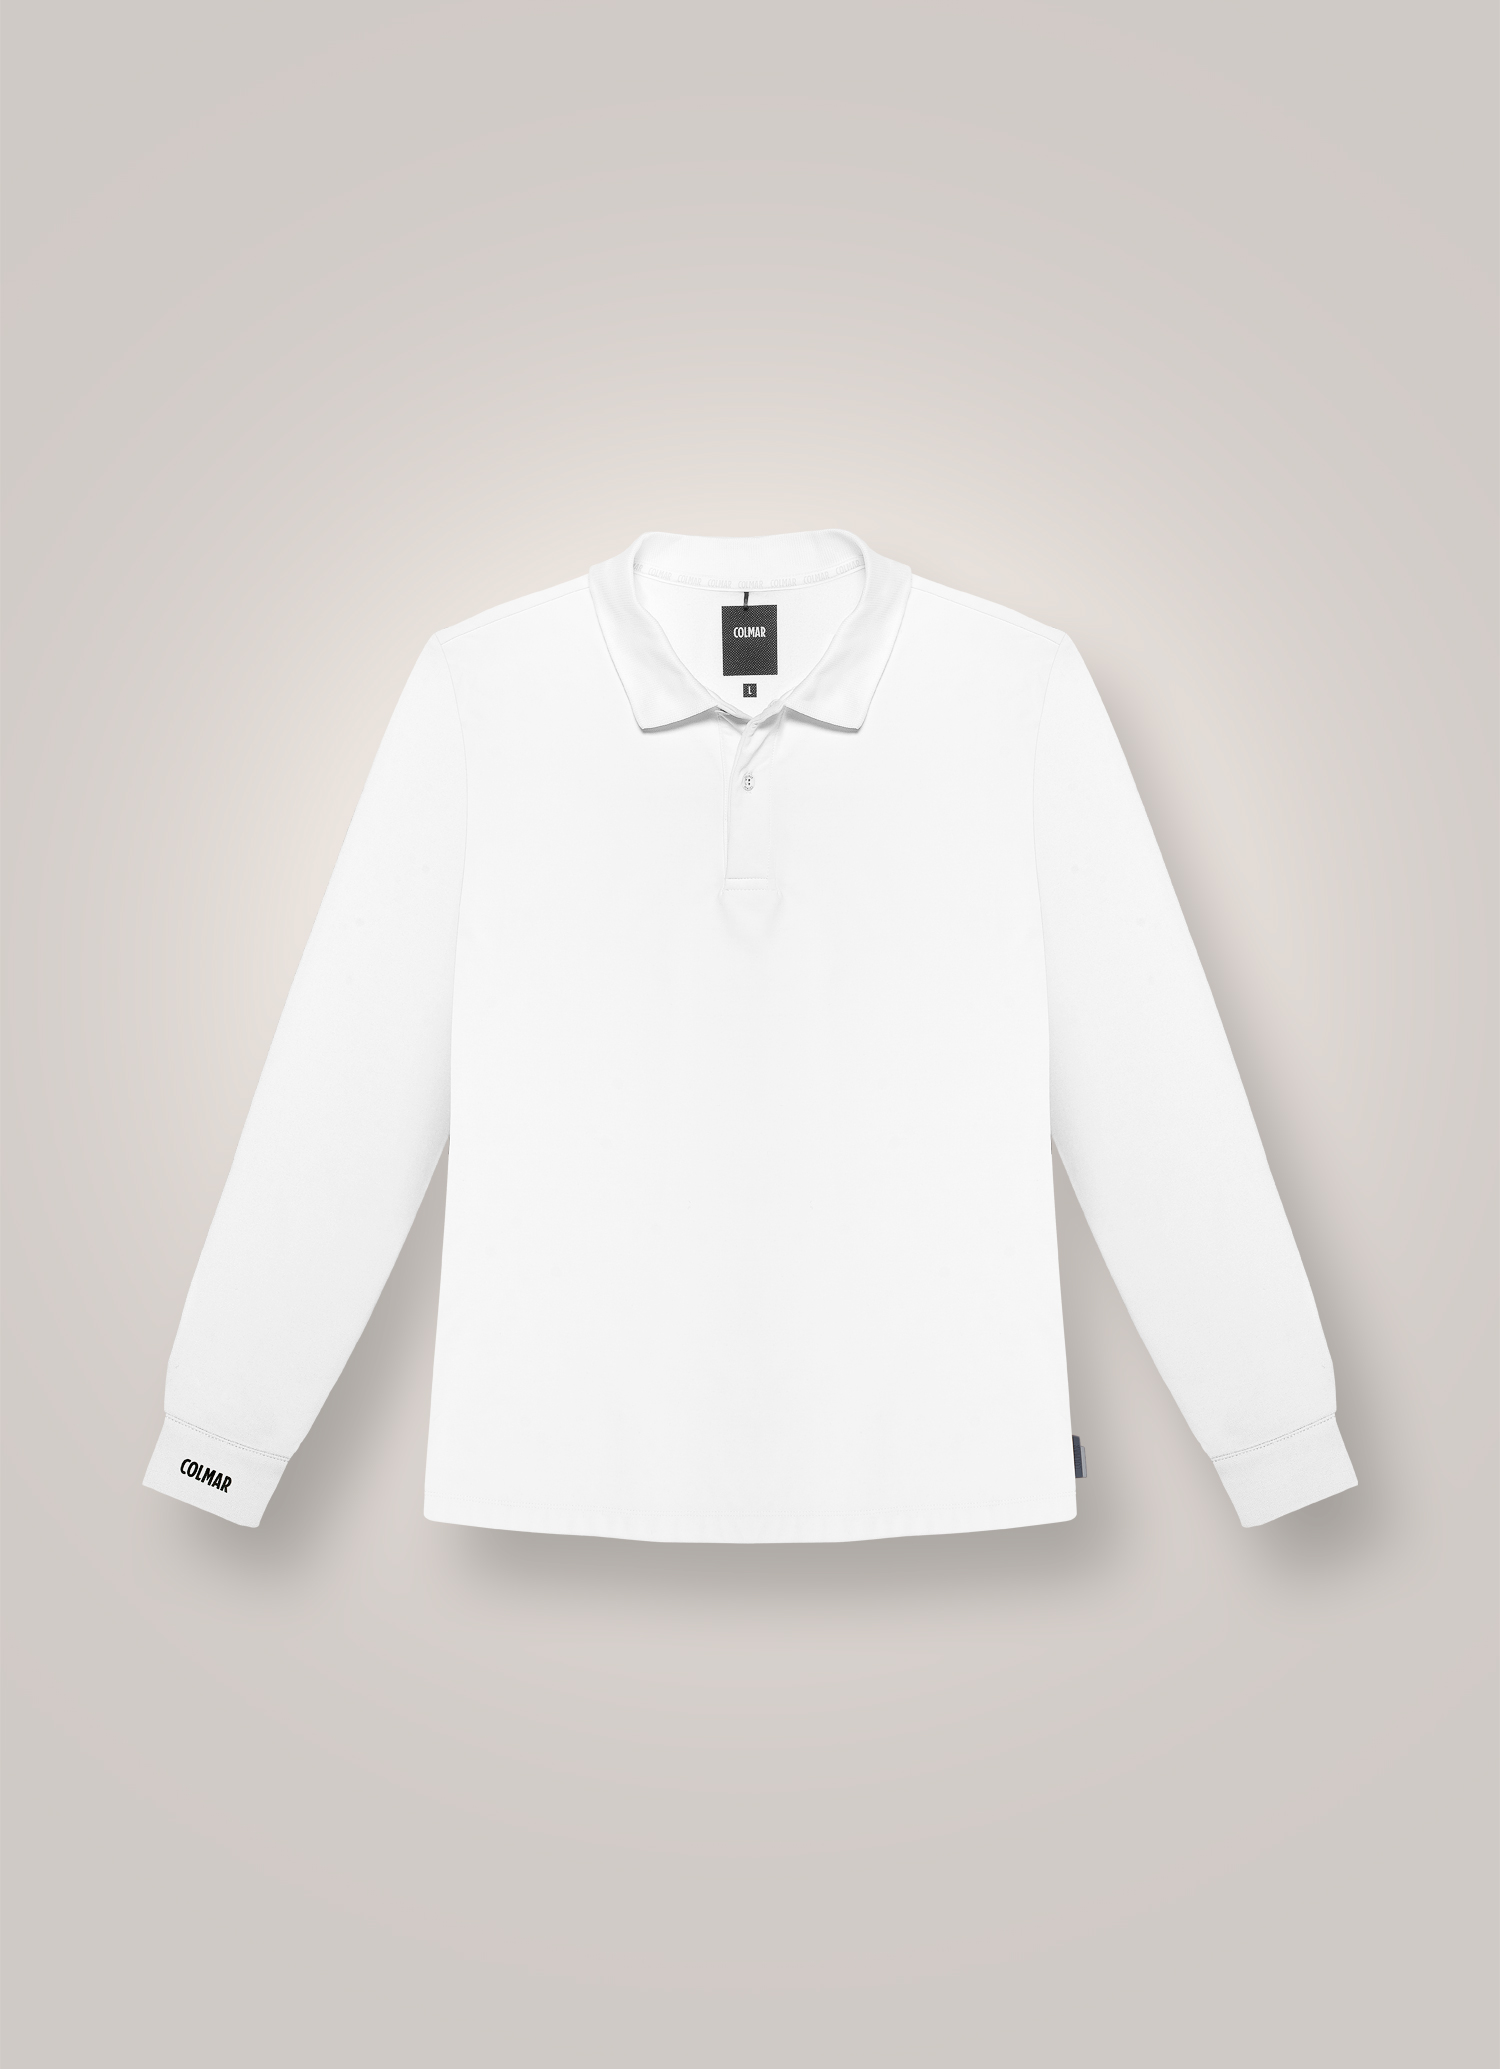 8995e522fb3df9 Plain Black Rugby Shirt - BCD Tofu House